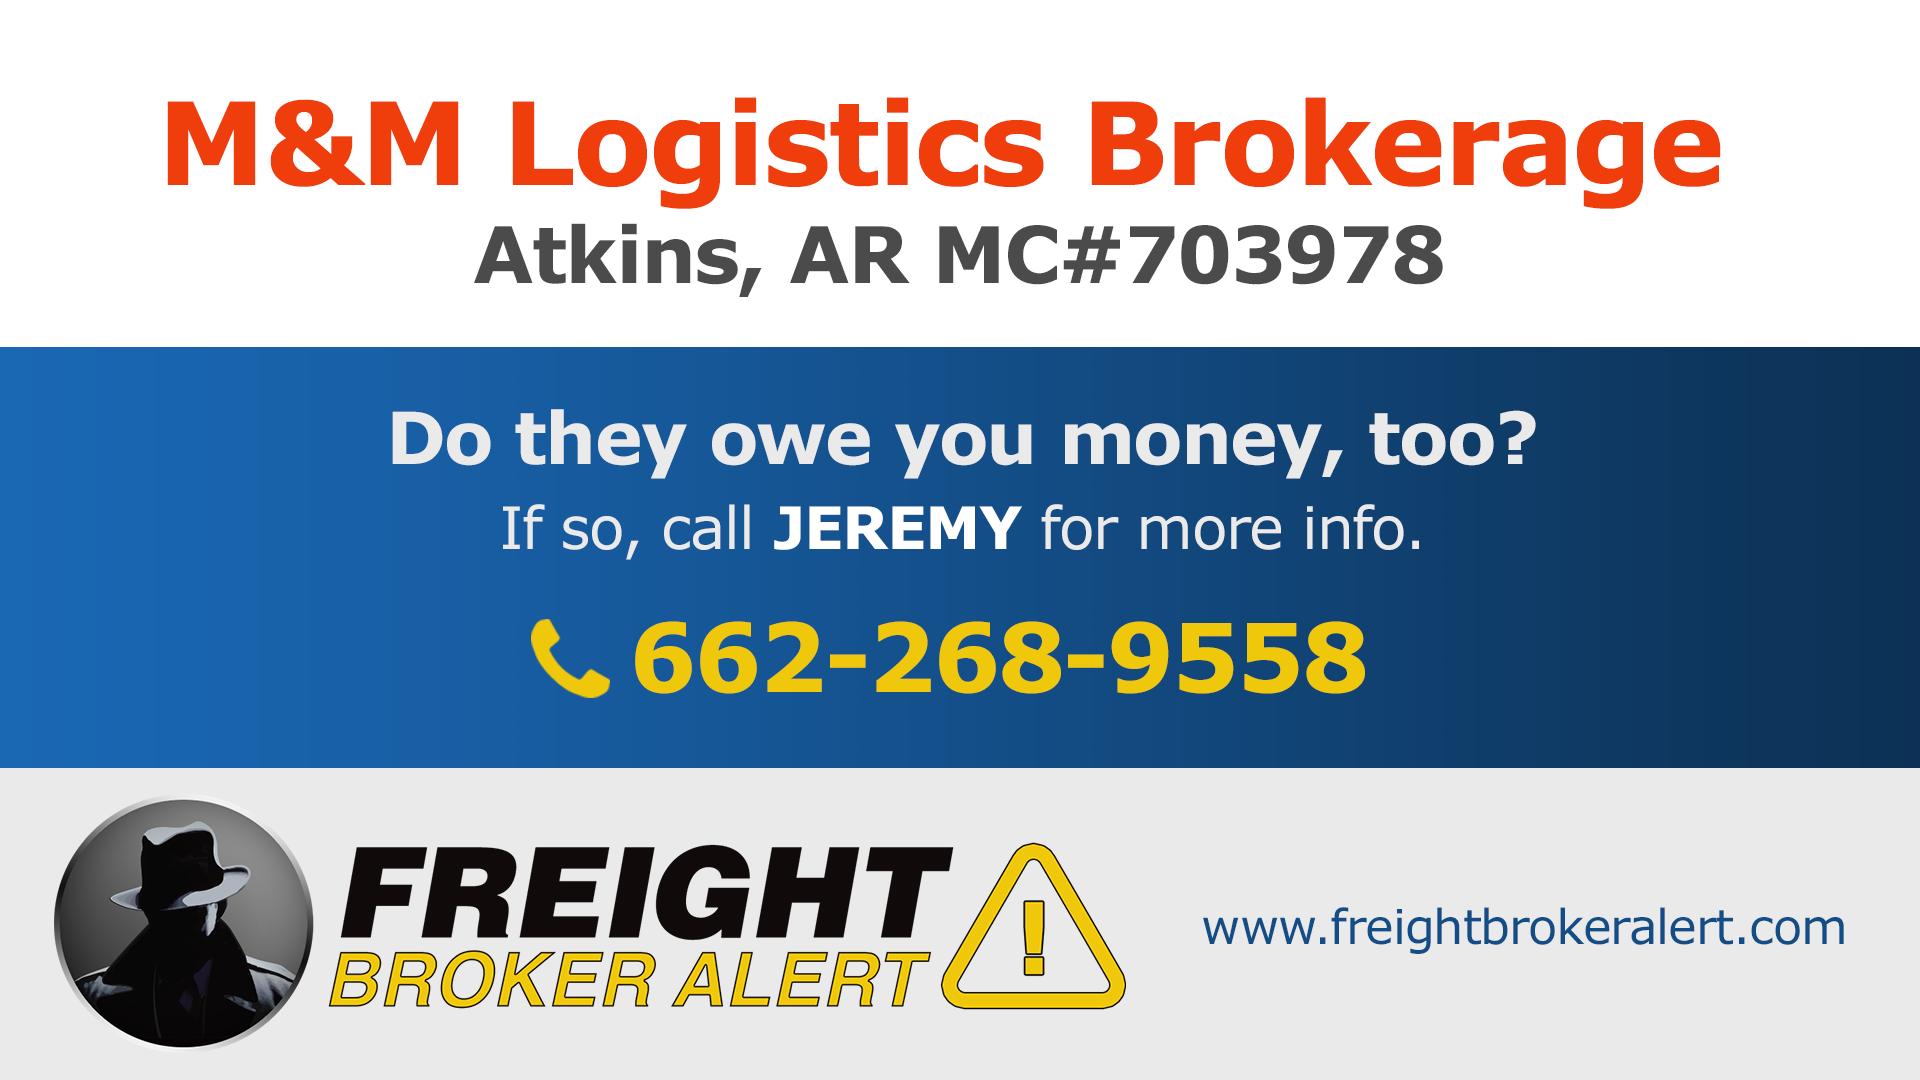 M&M Logistics Brokerage Inc Arkansas